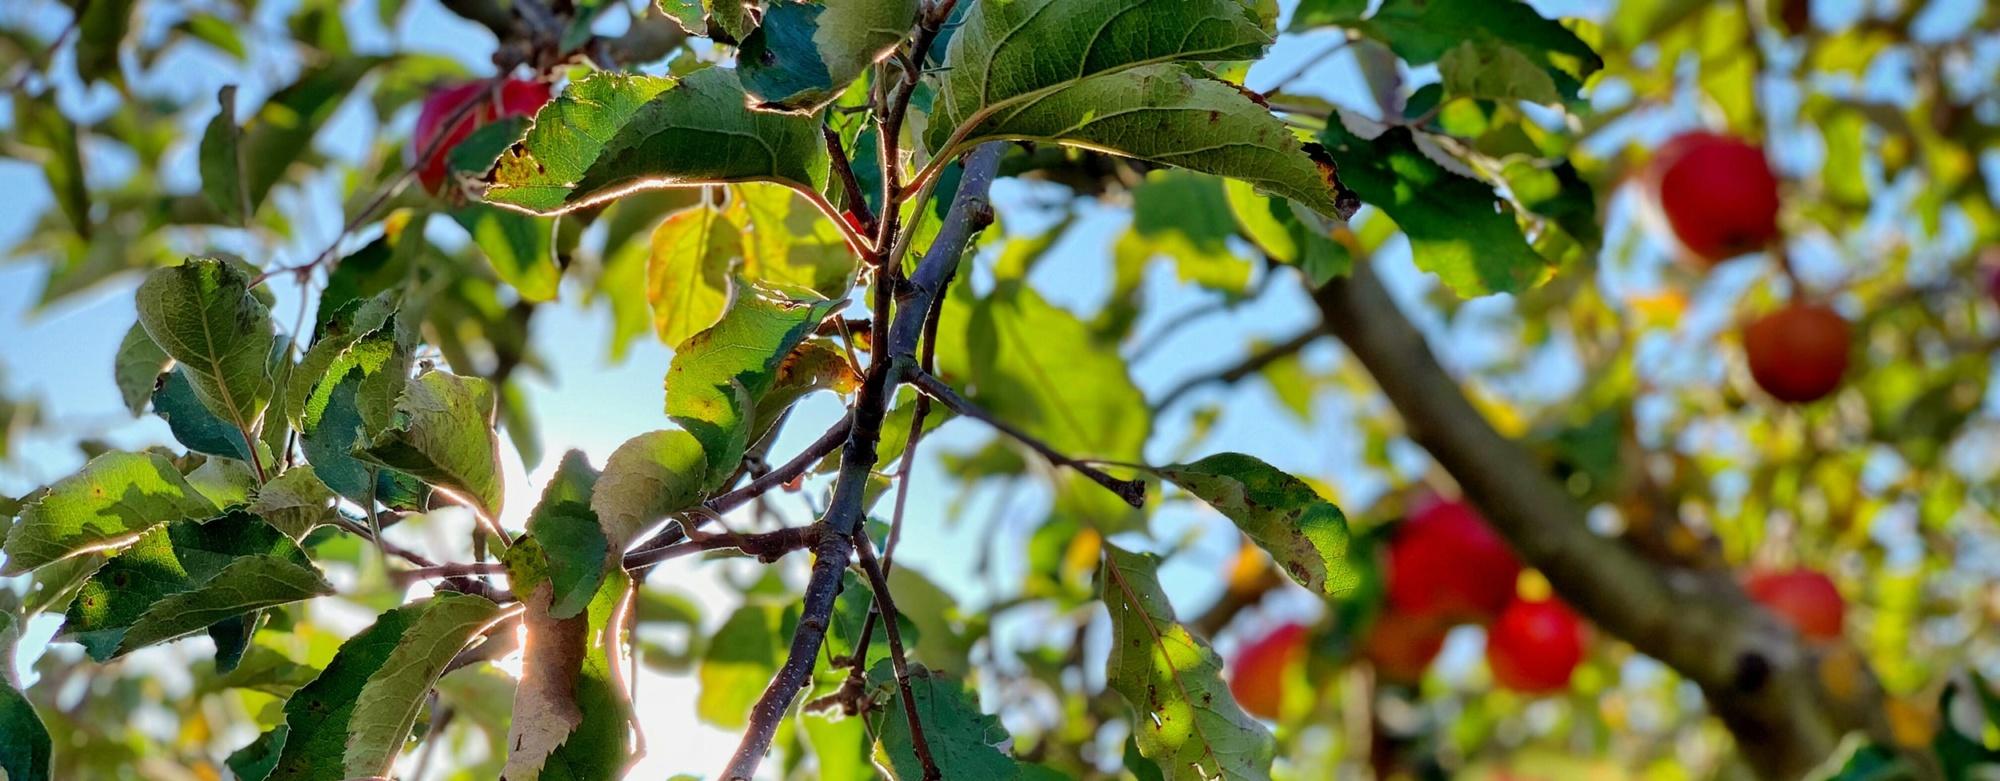 Pomme Joya - Une pomme haute en couleurs